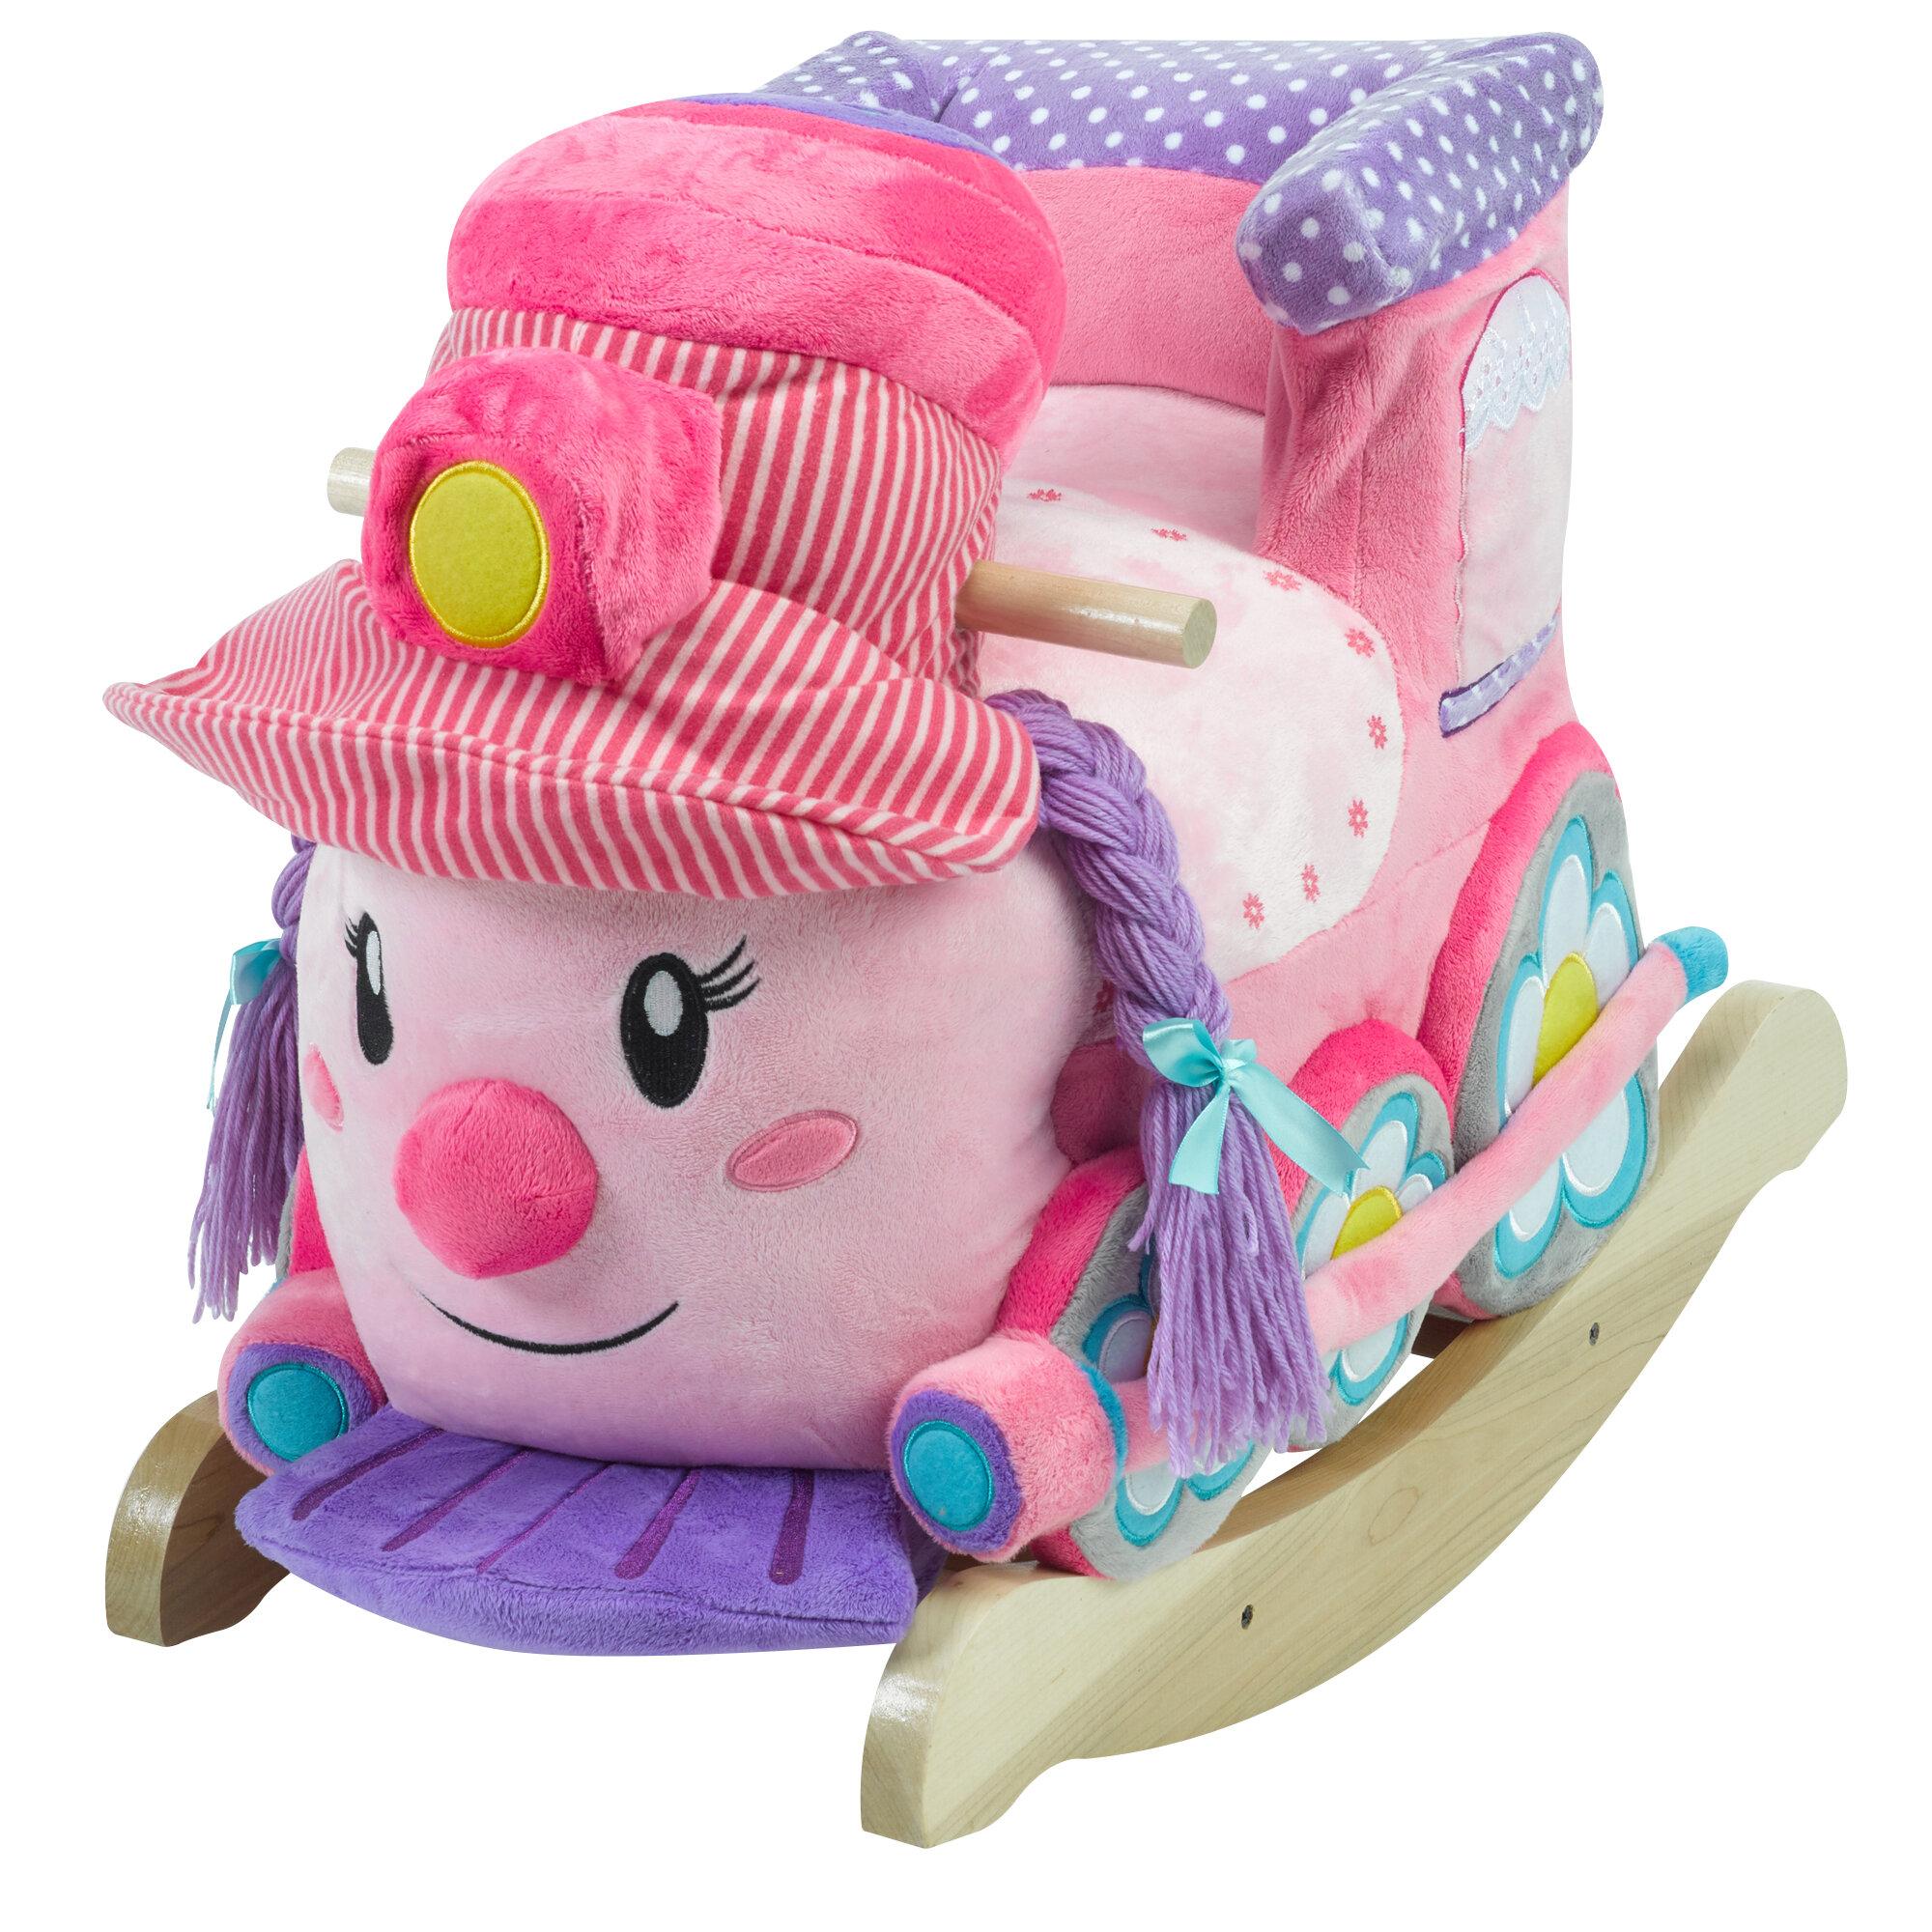 ghdonat.com Baby & Toddler Toys Toys & Games Rockabye Mermaid ...